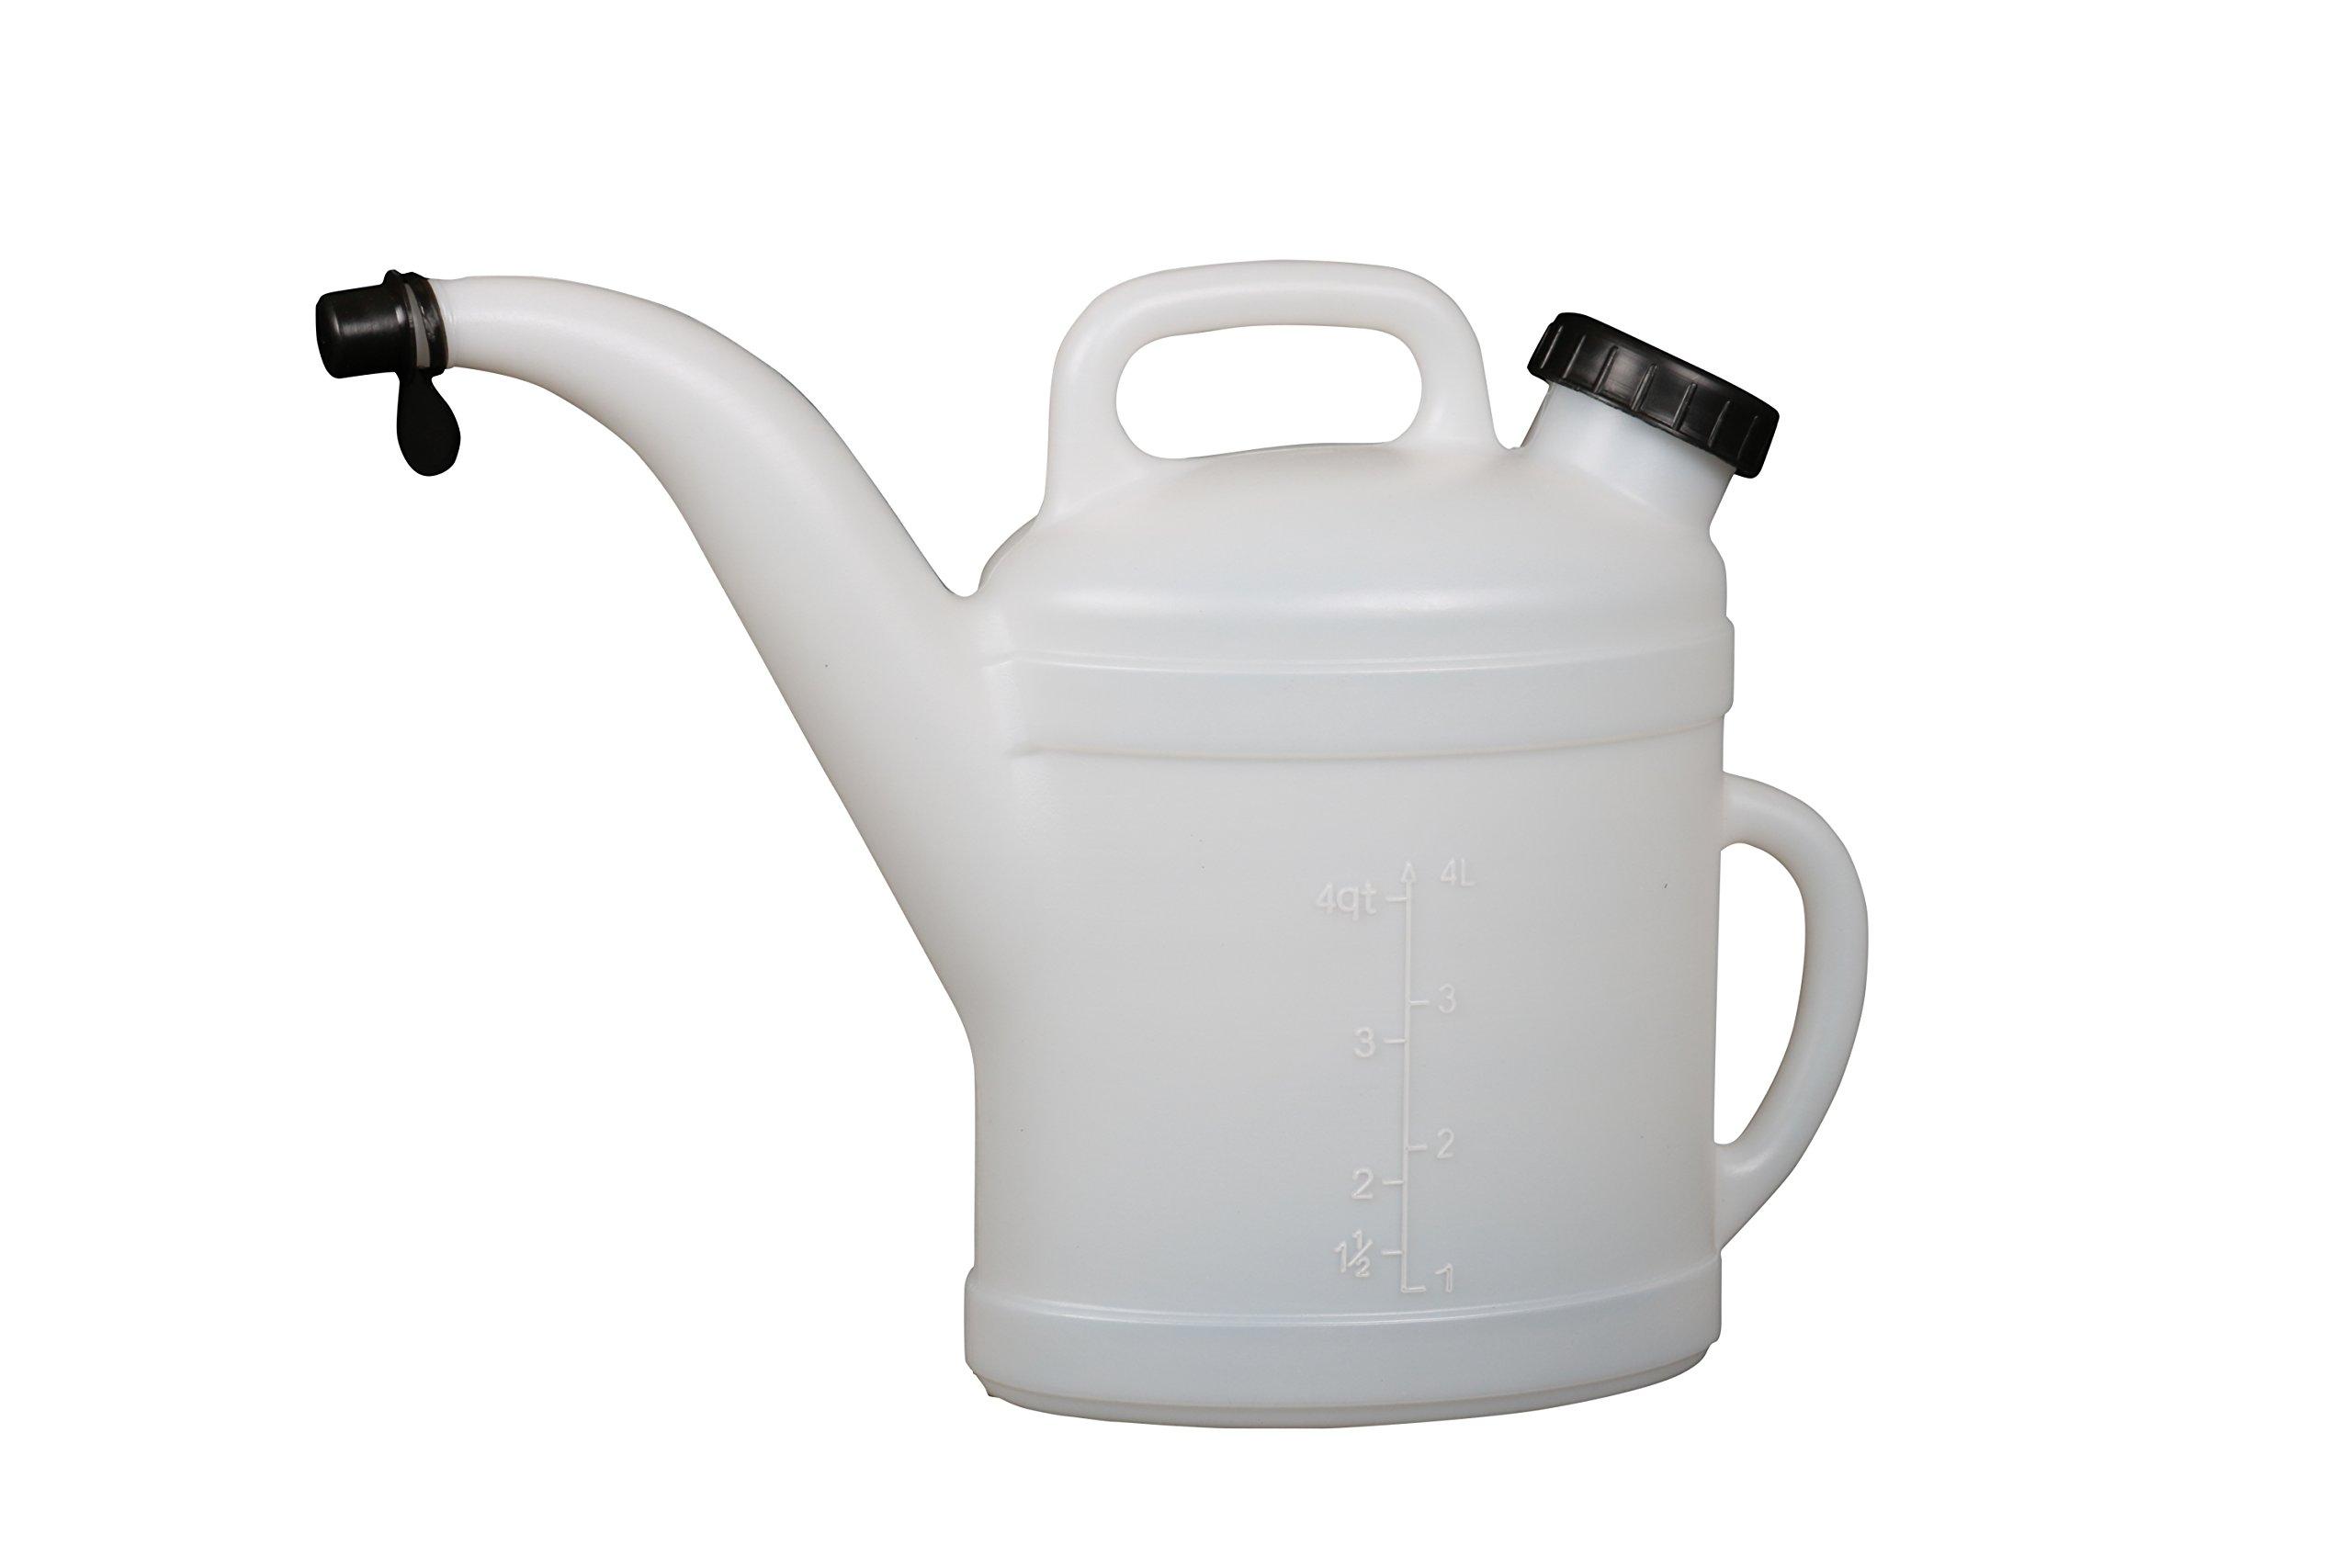 WirthCo 32375 Funnel King High Density Polyethylene Pitcher - 6 Liter Capacity